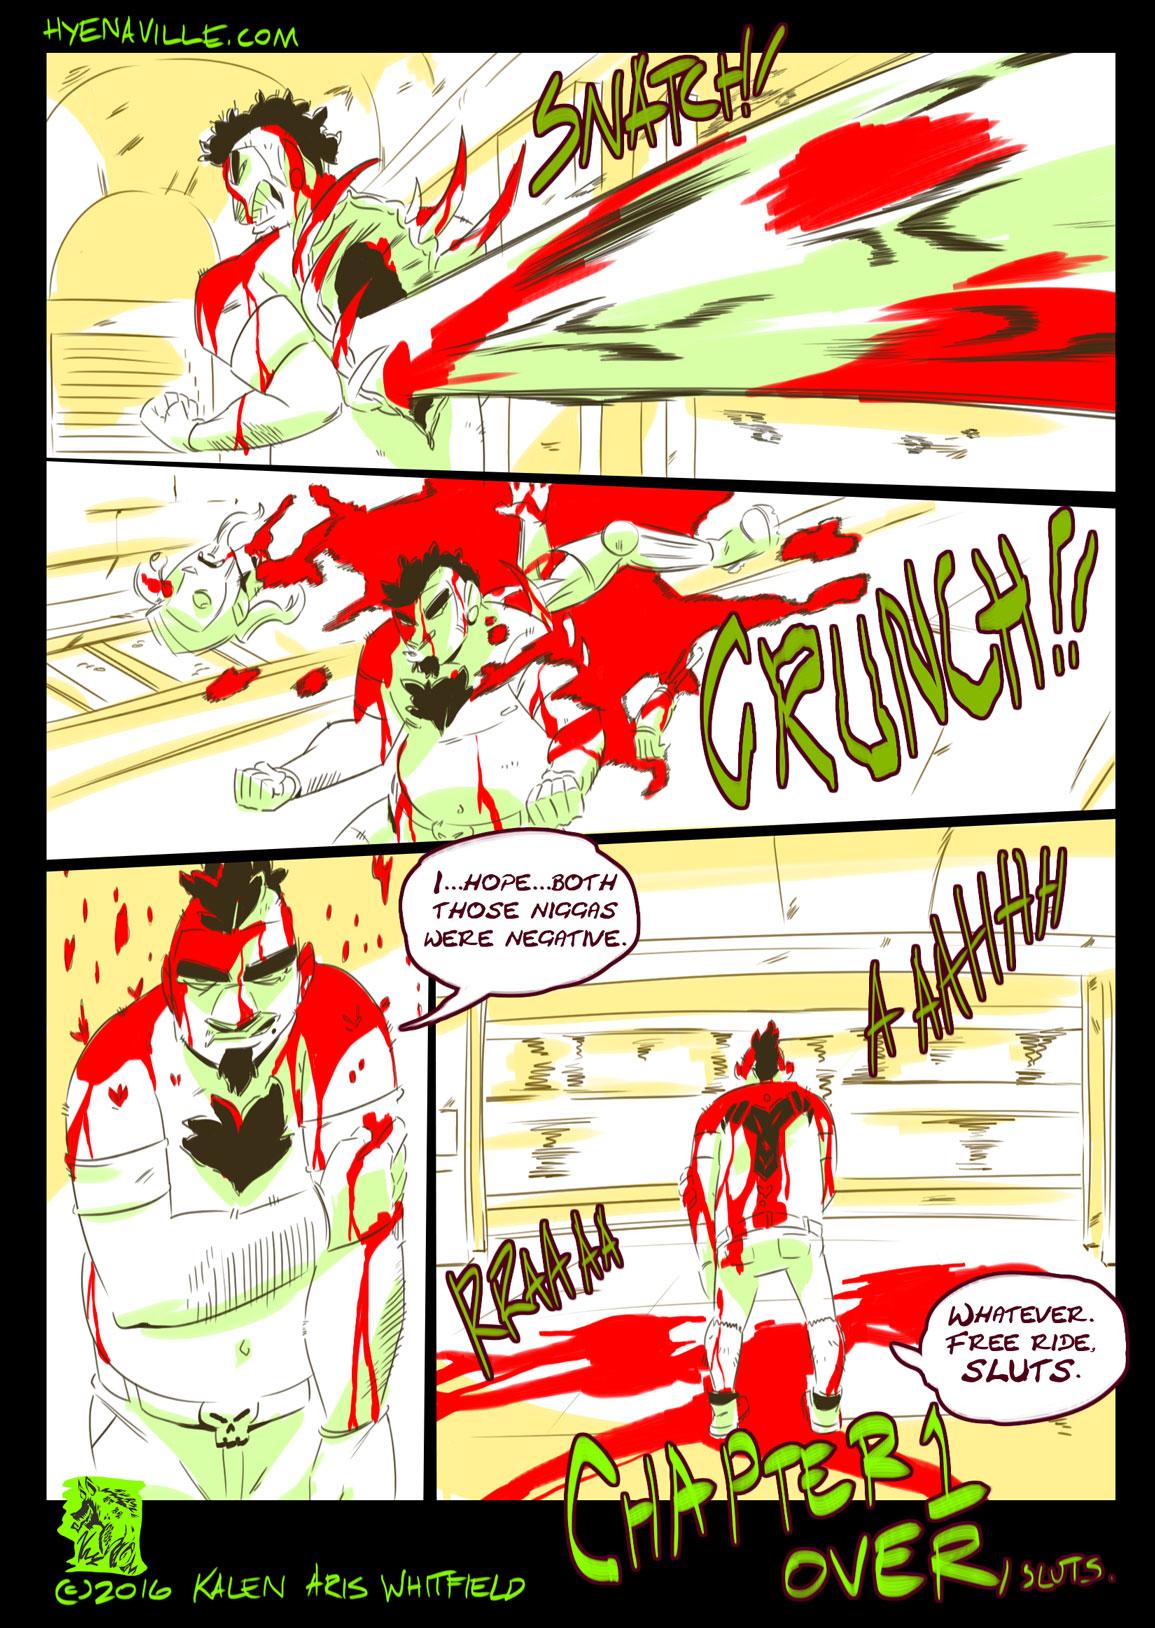 HYENAVILLE page 6